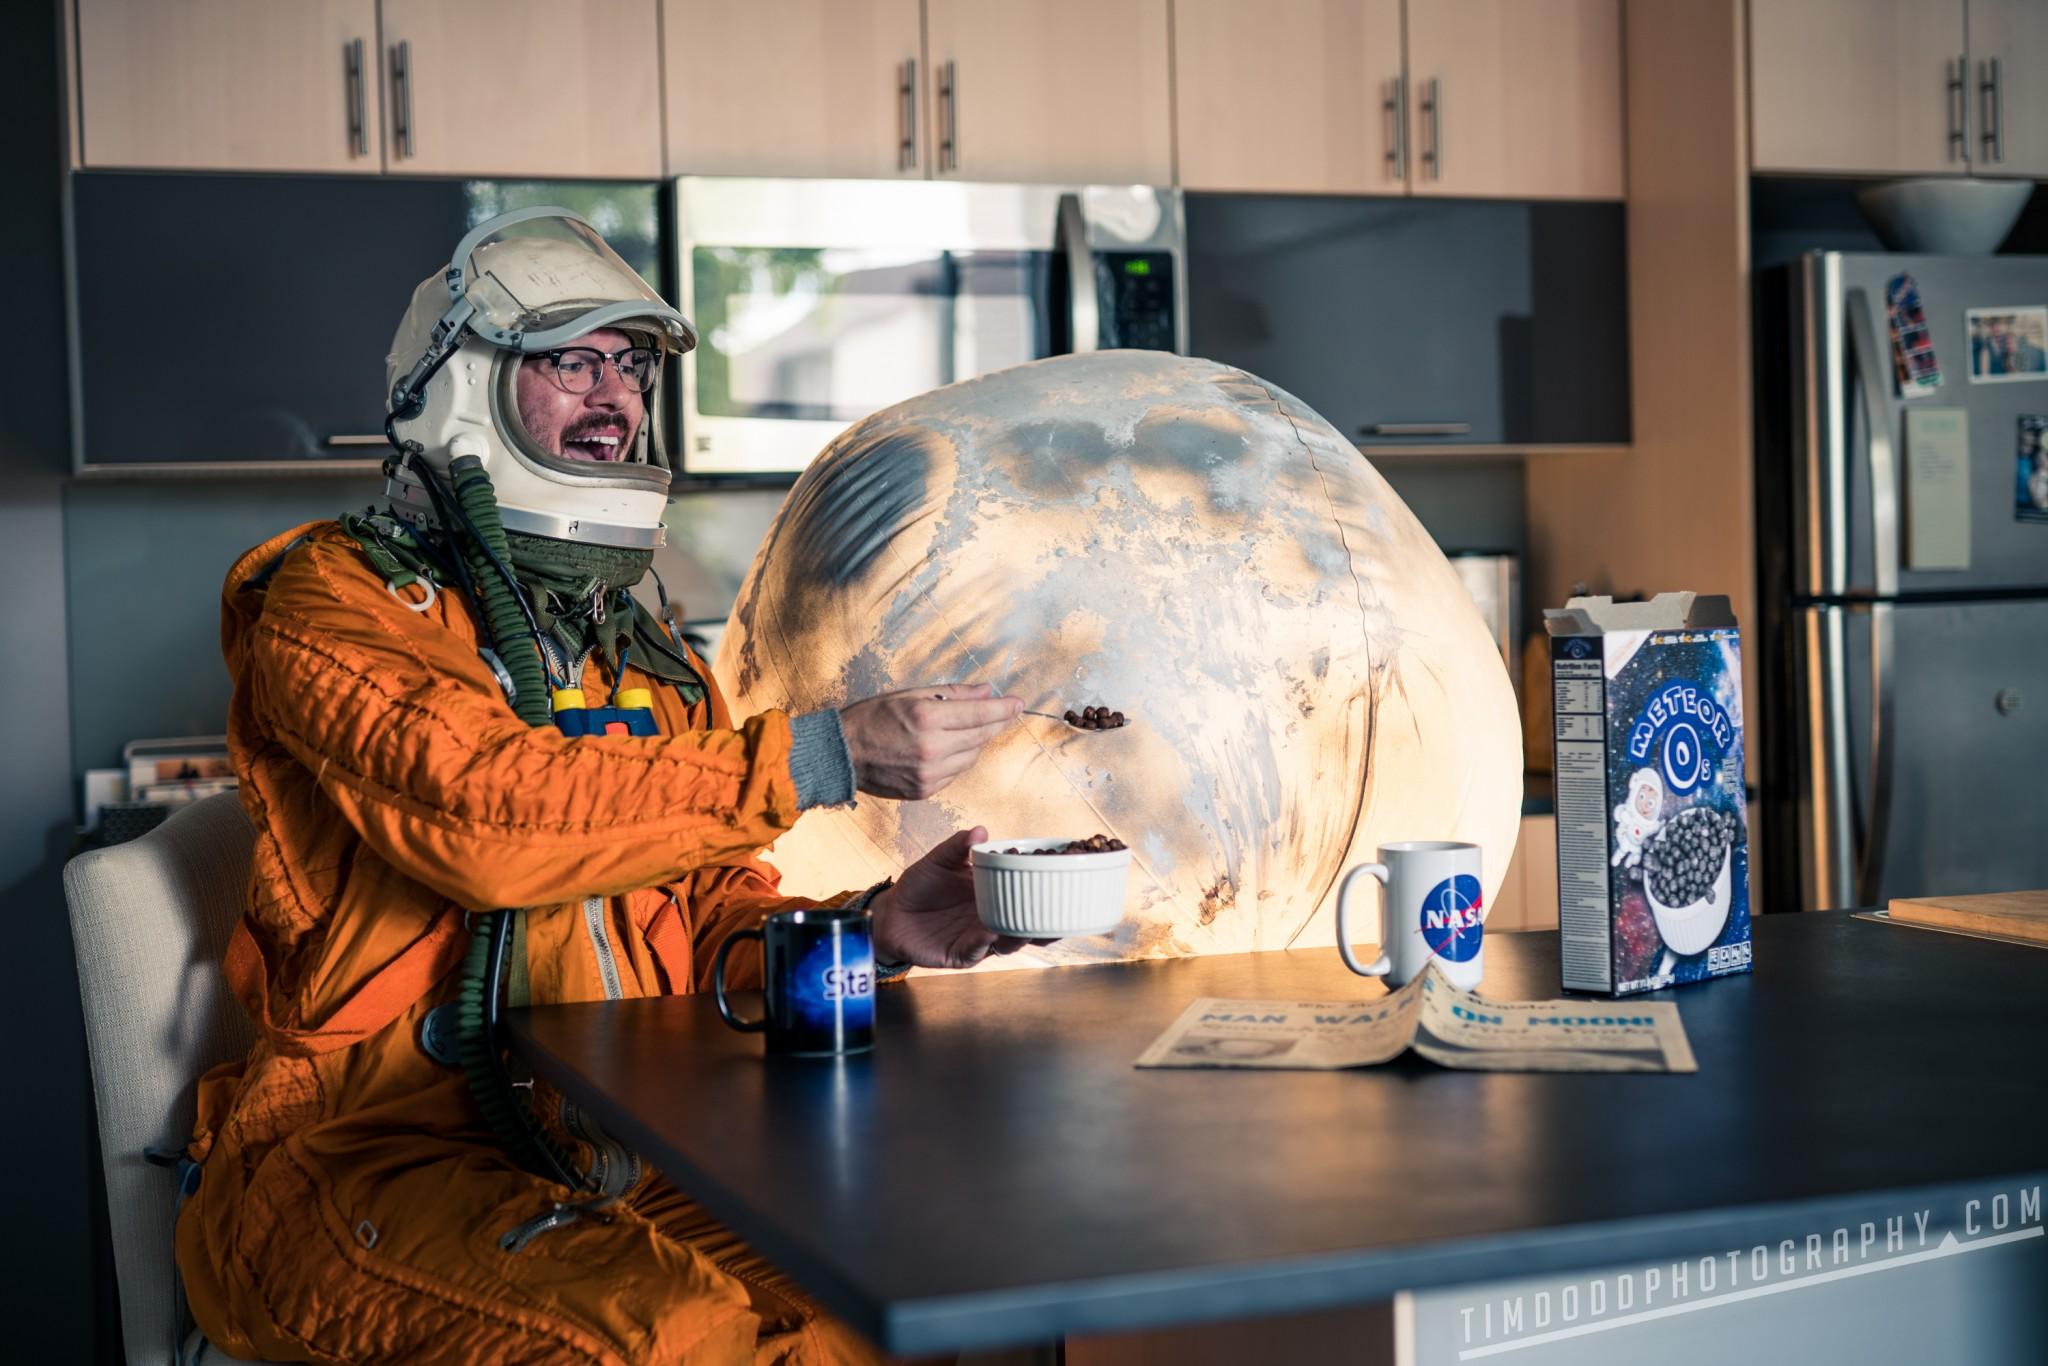 Photo Credit:  Tim Dodd, Everyday Astronaut